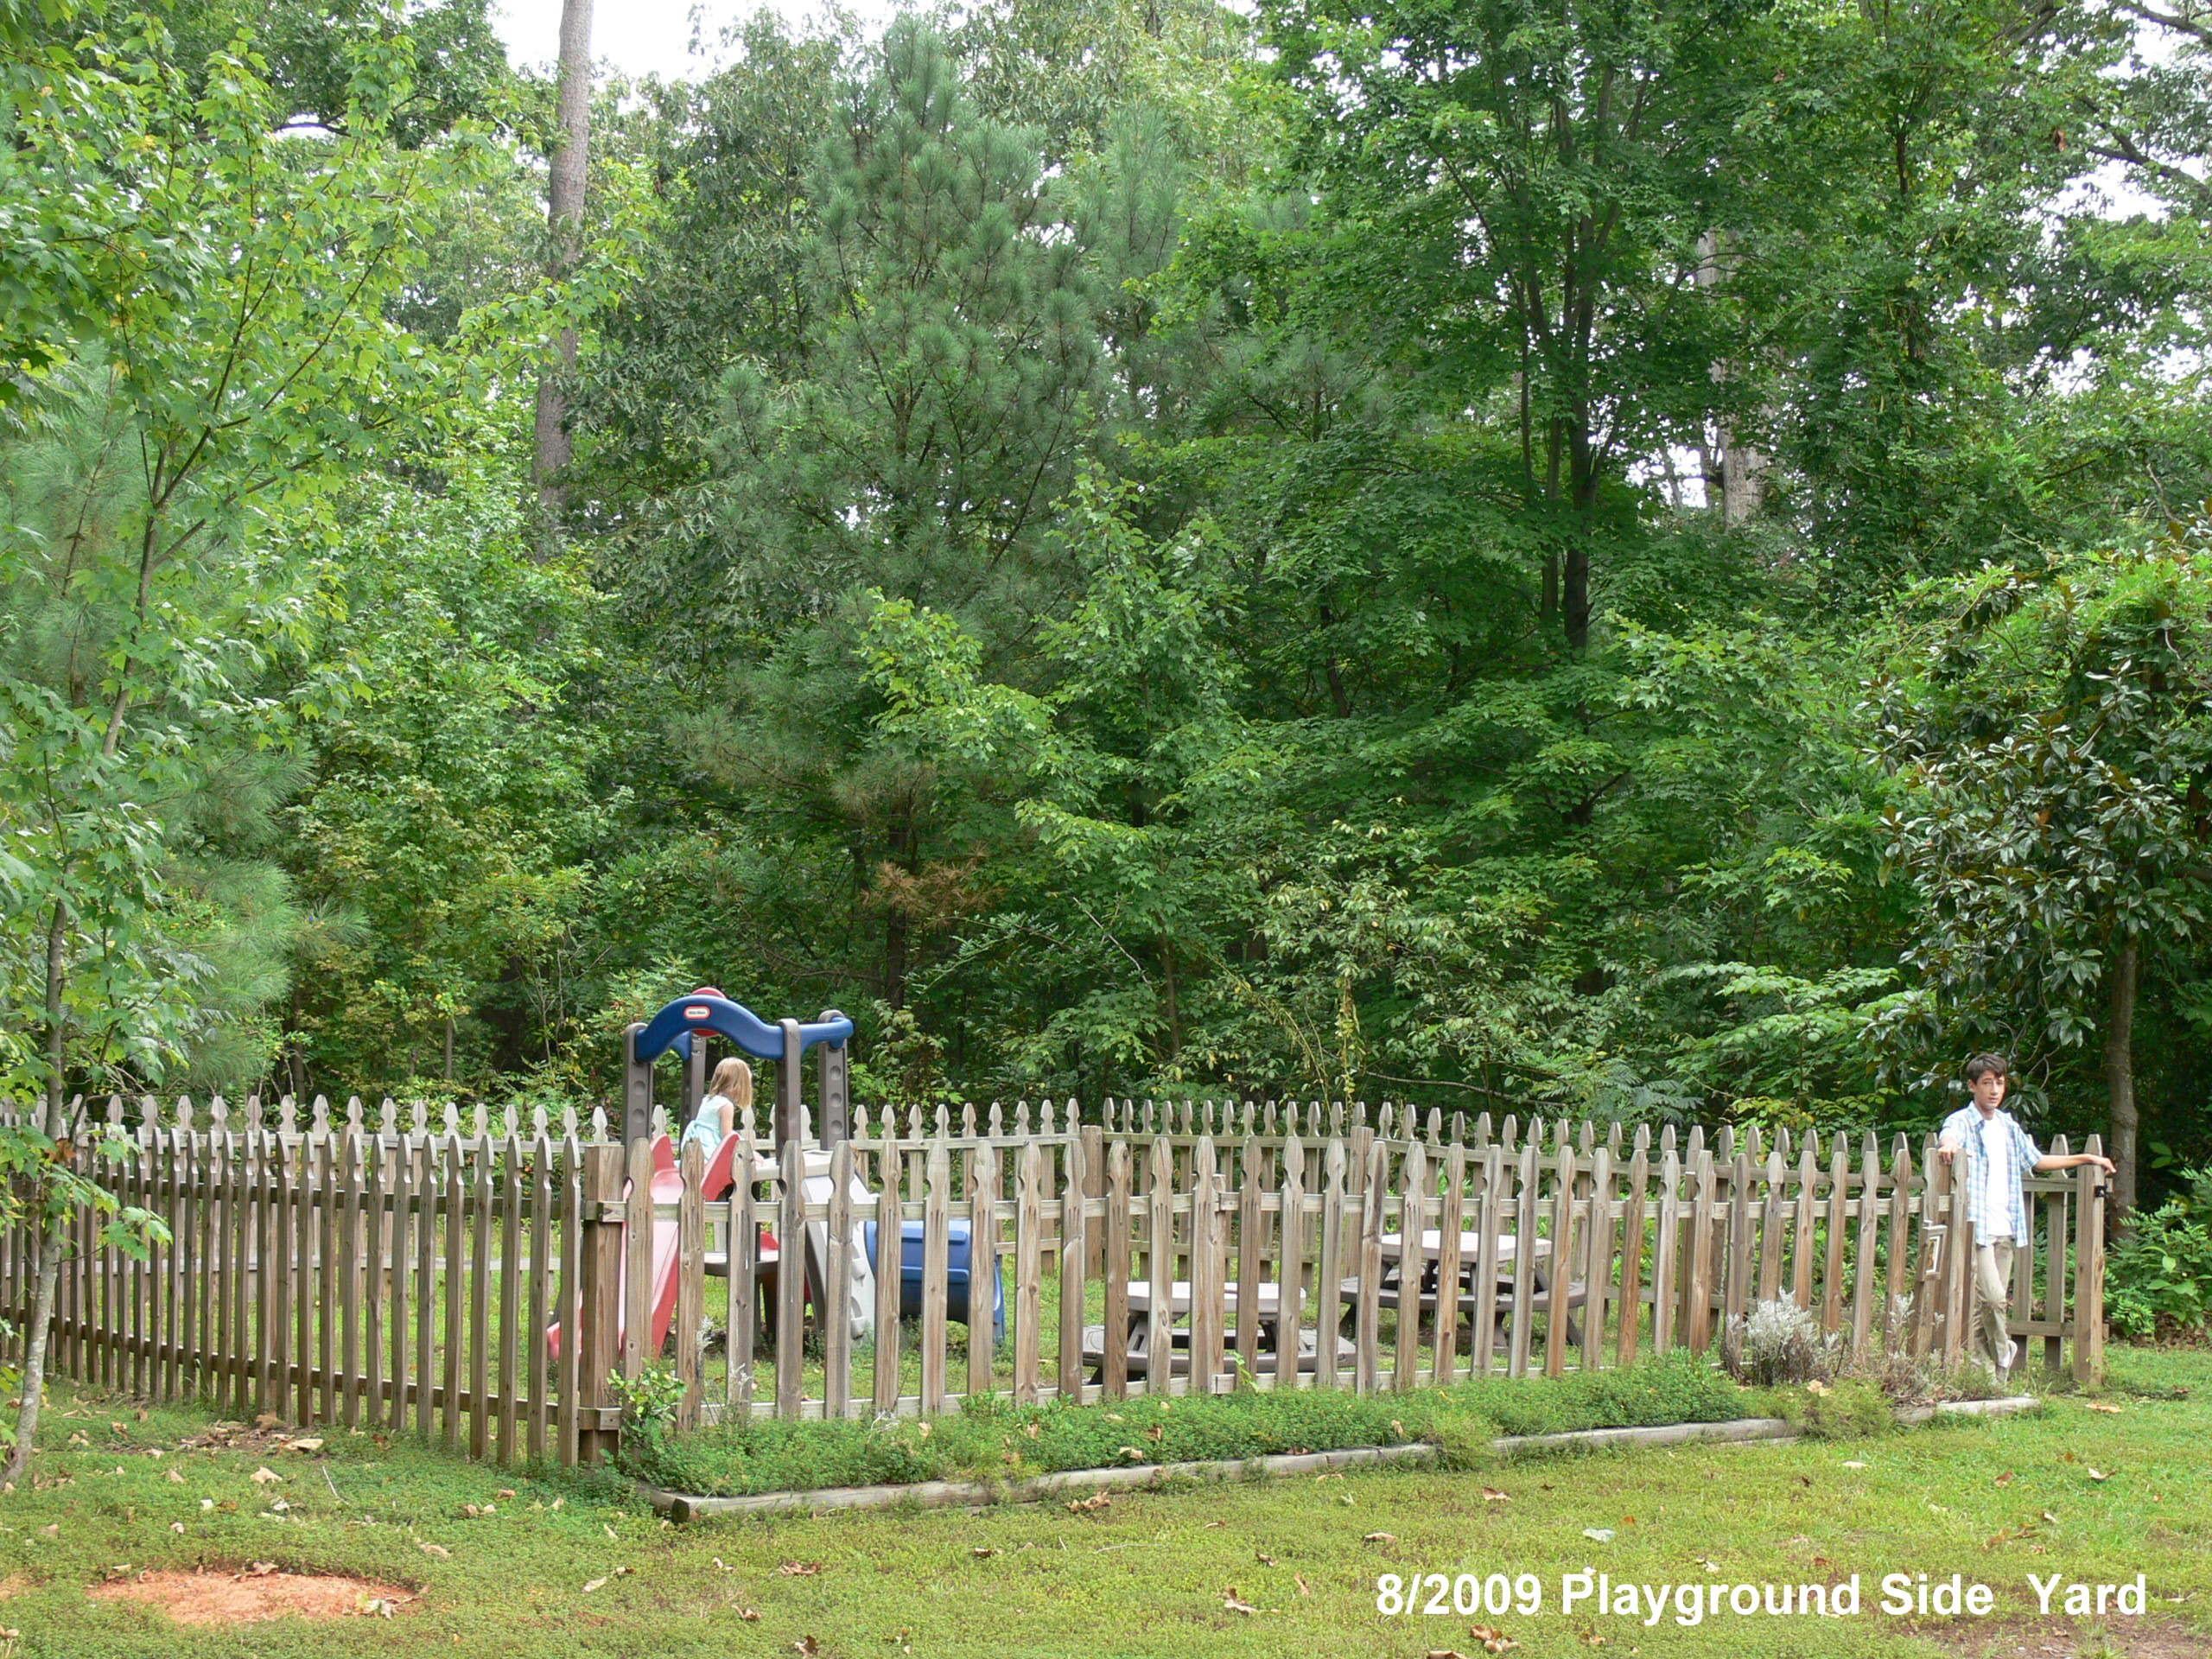 Playground side yard